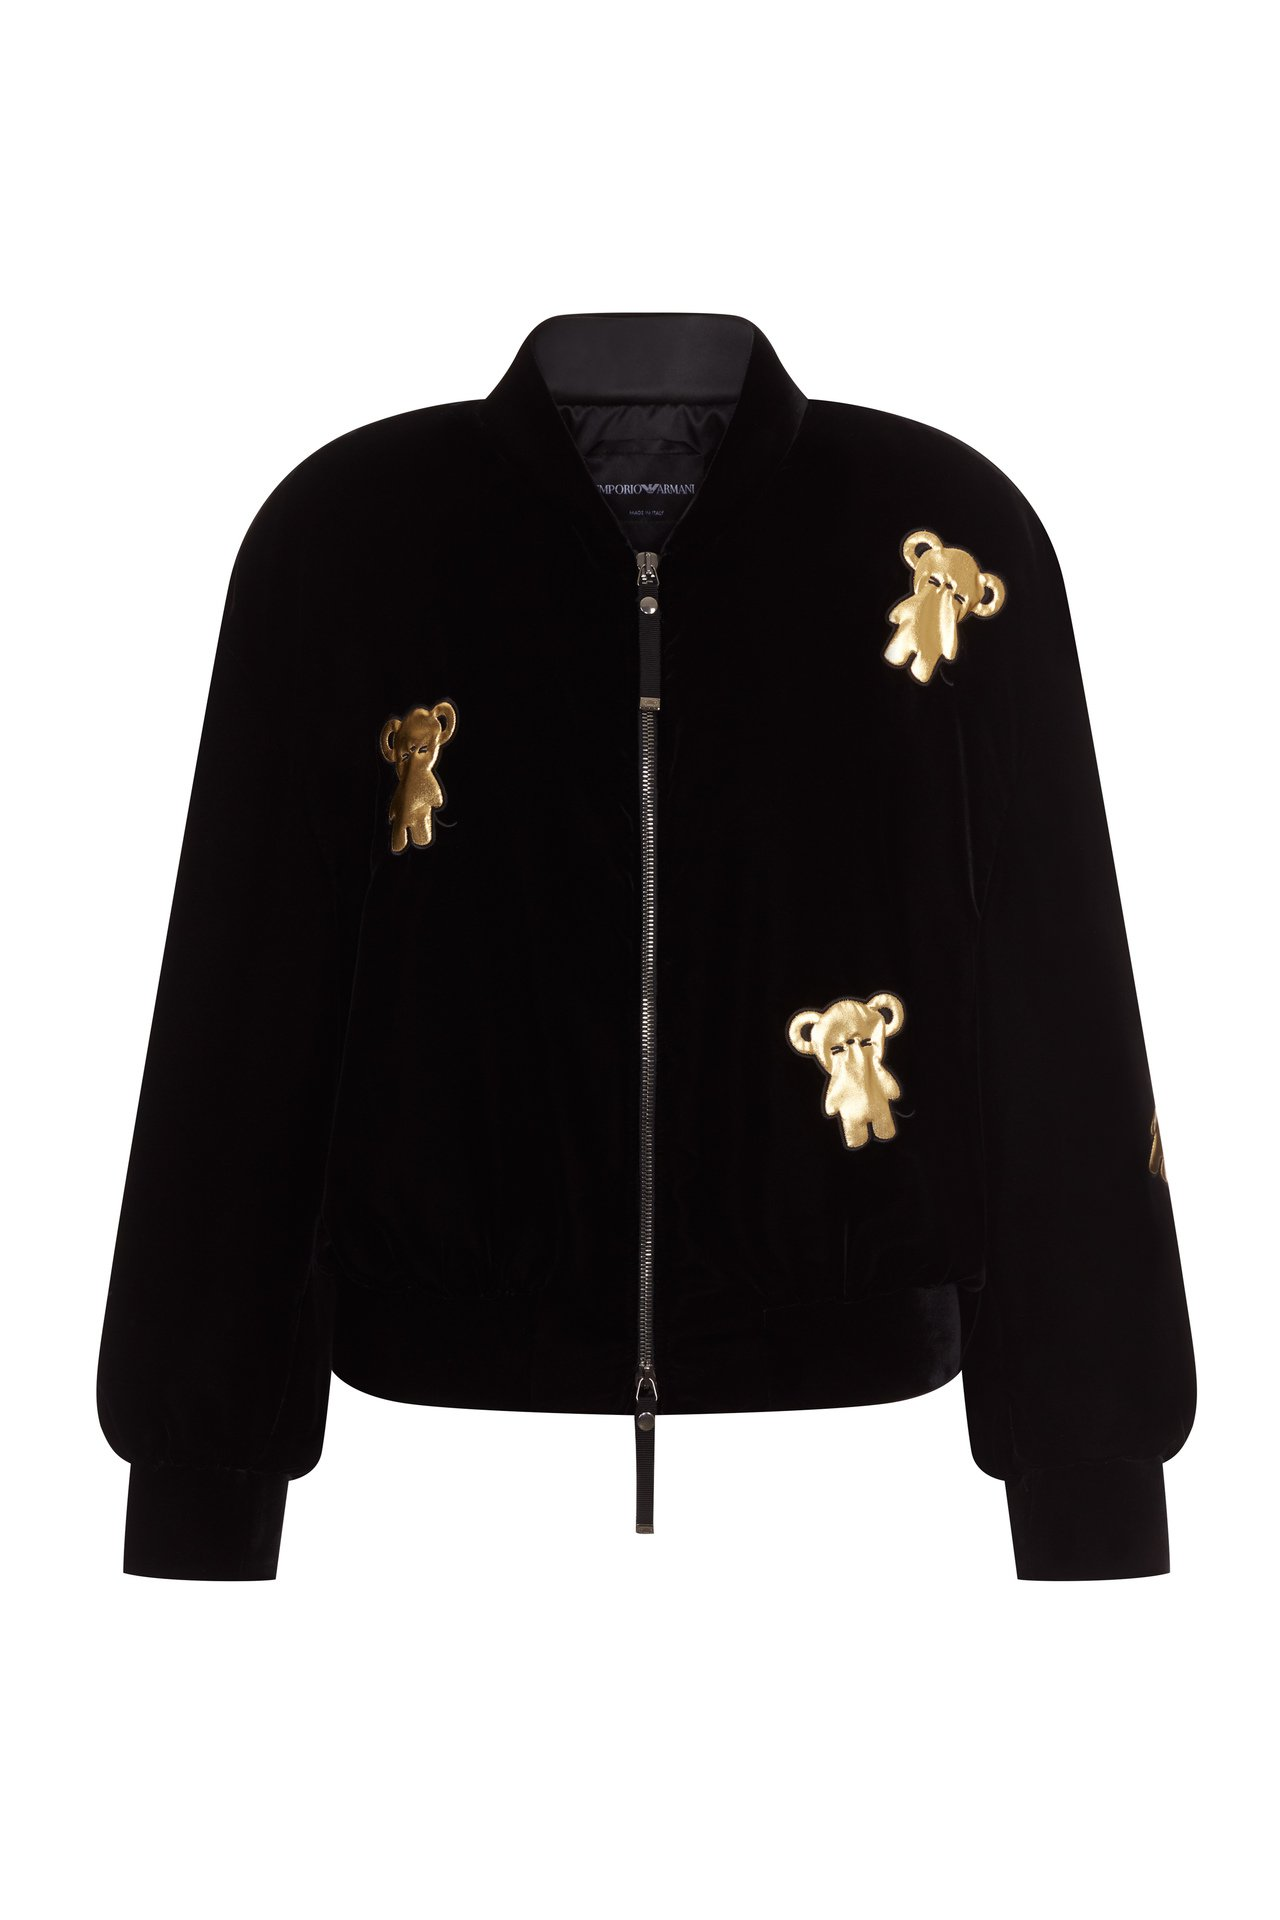 Emporio Armani新年系列黑色休閒外套裝飾金色老鼠圖騰。圖/嘉裕提供